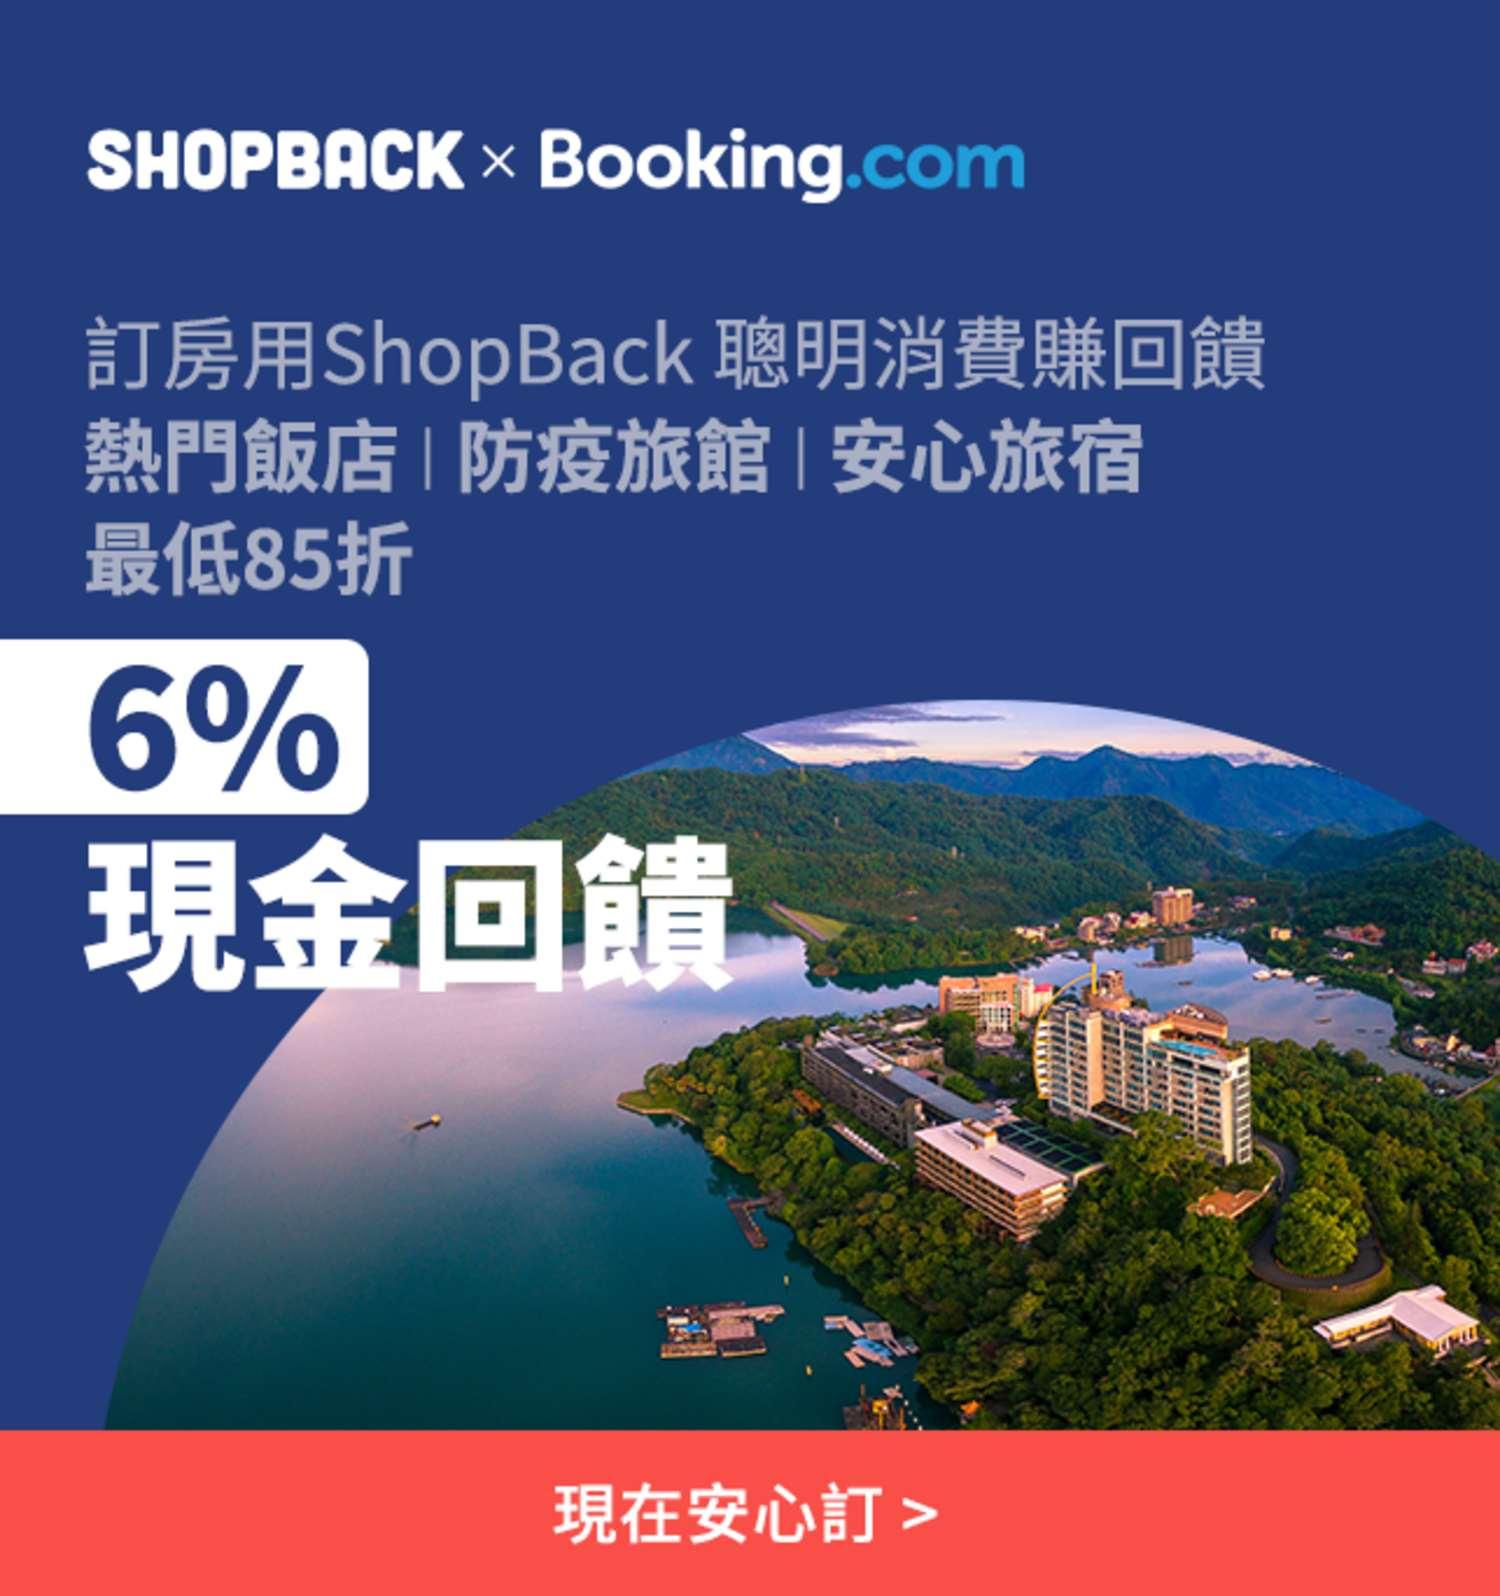 Booking.com 獨家合作